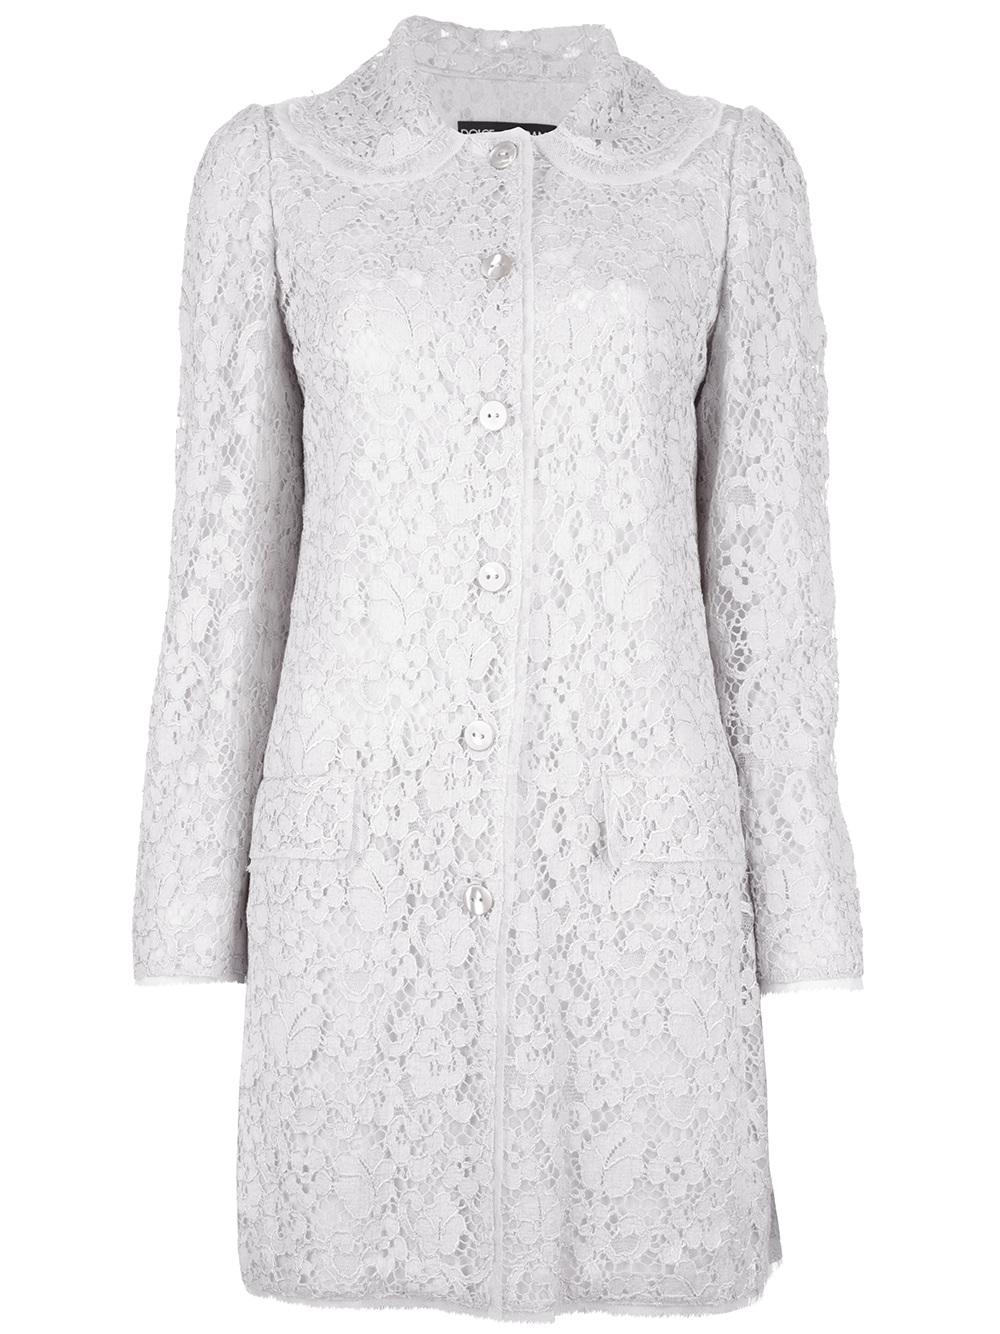 Dolce Amp Gabbana Lace Dress Coat In White Lyst